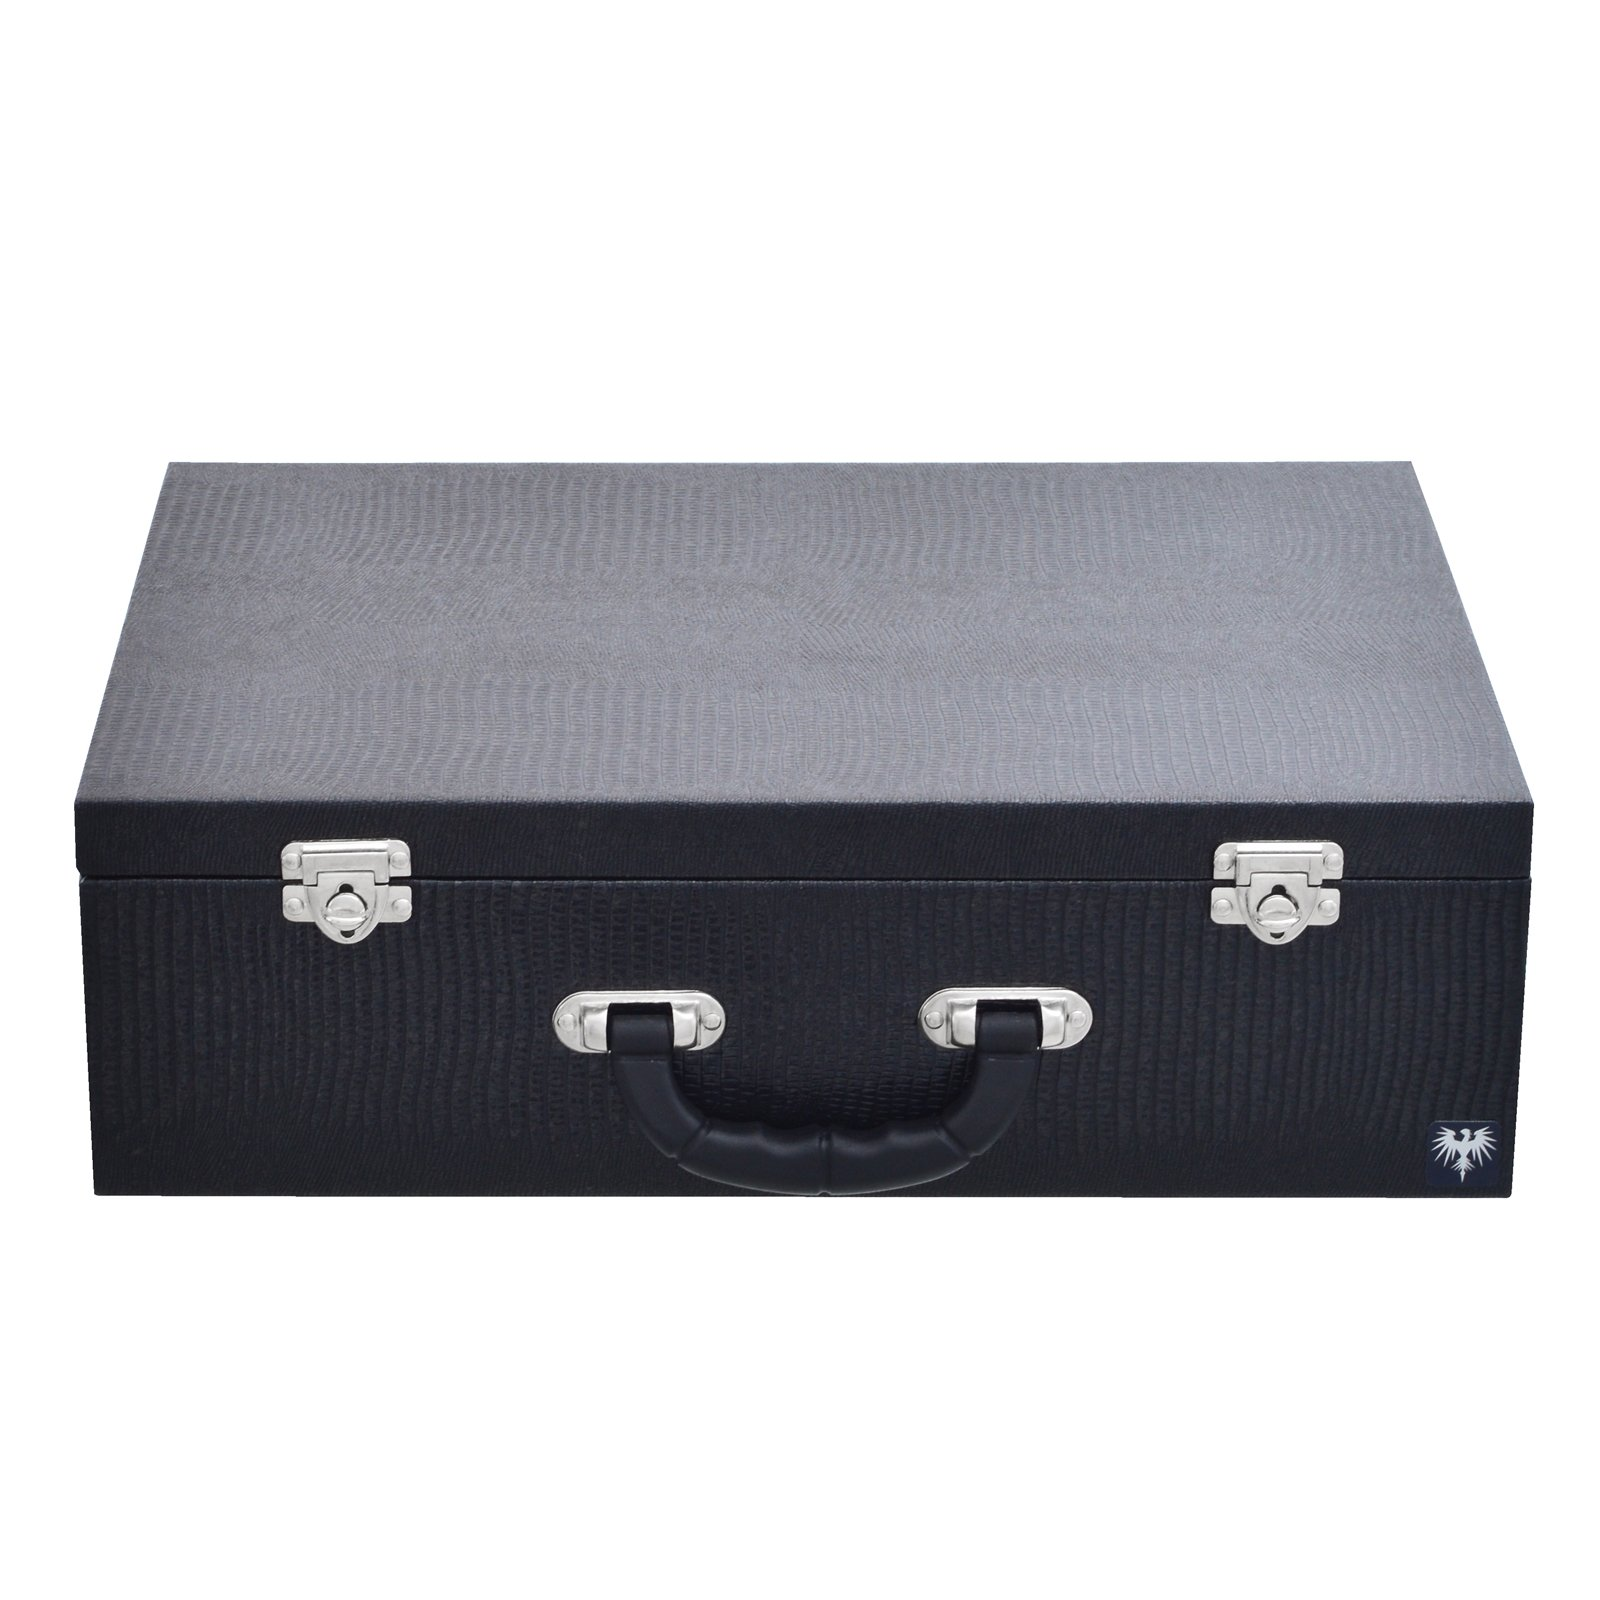 maleta-porta-relogio-36-nichos-couro-ecologico-preto-preto-imagem-8.JPG